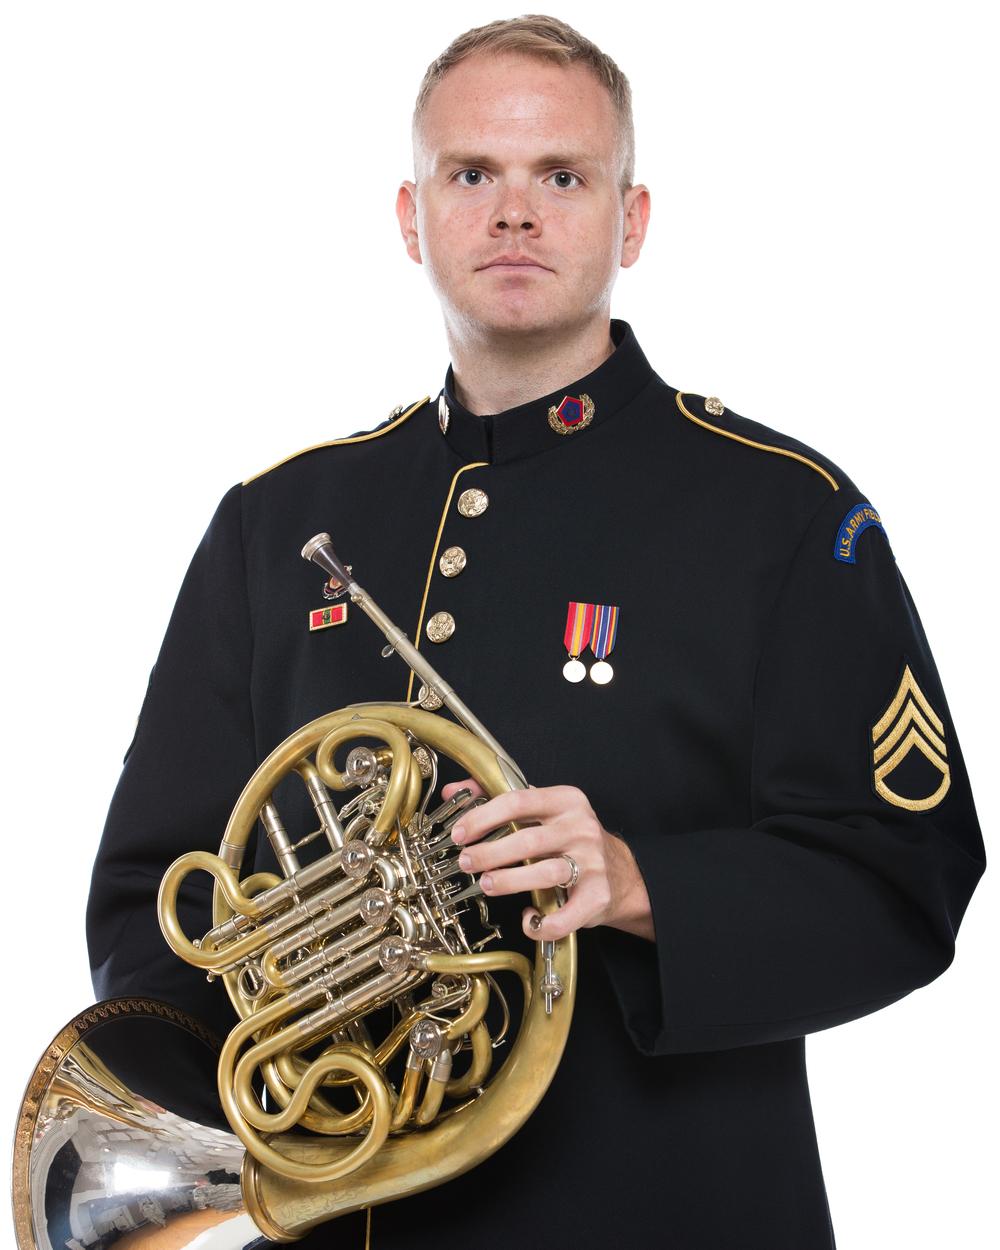 Staff Sergeant J.G. Miller